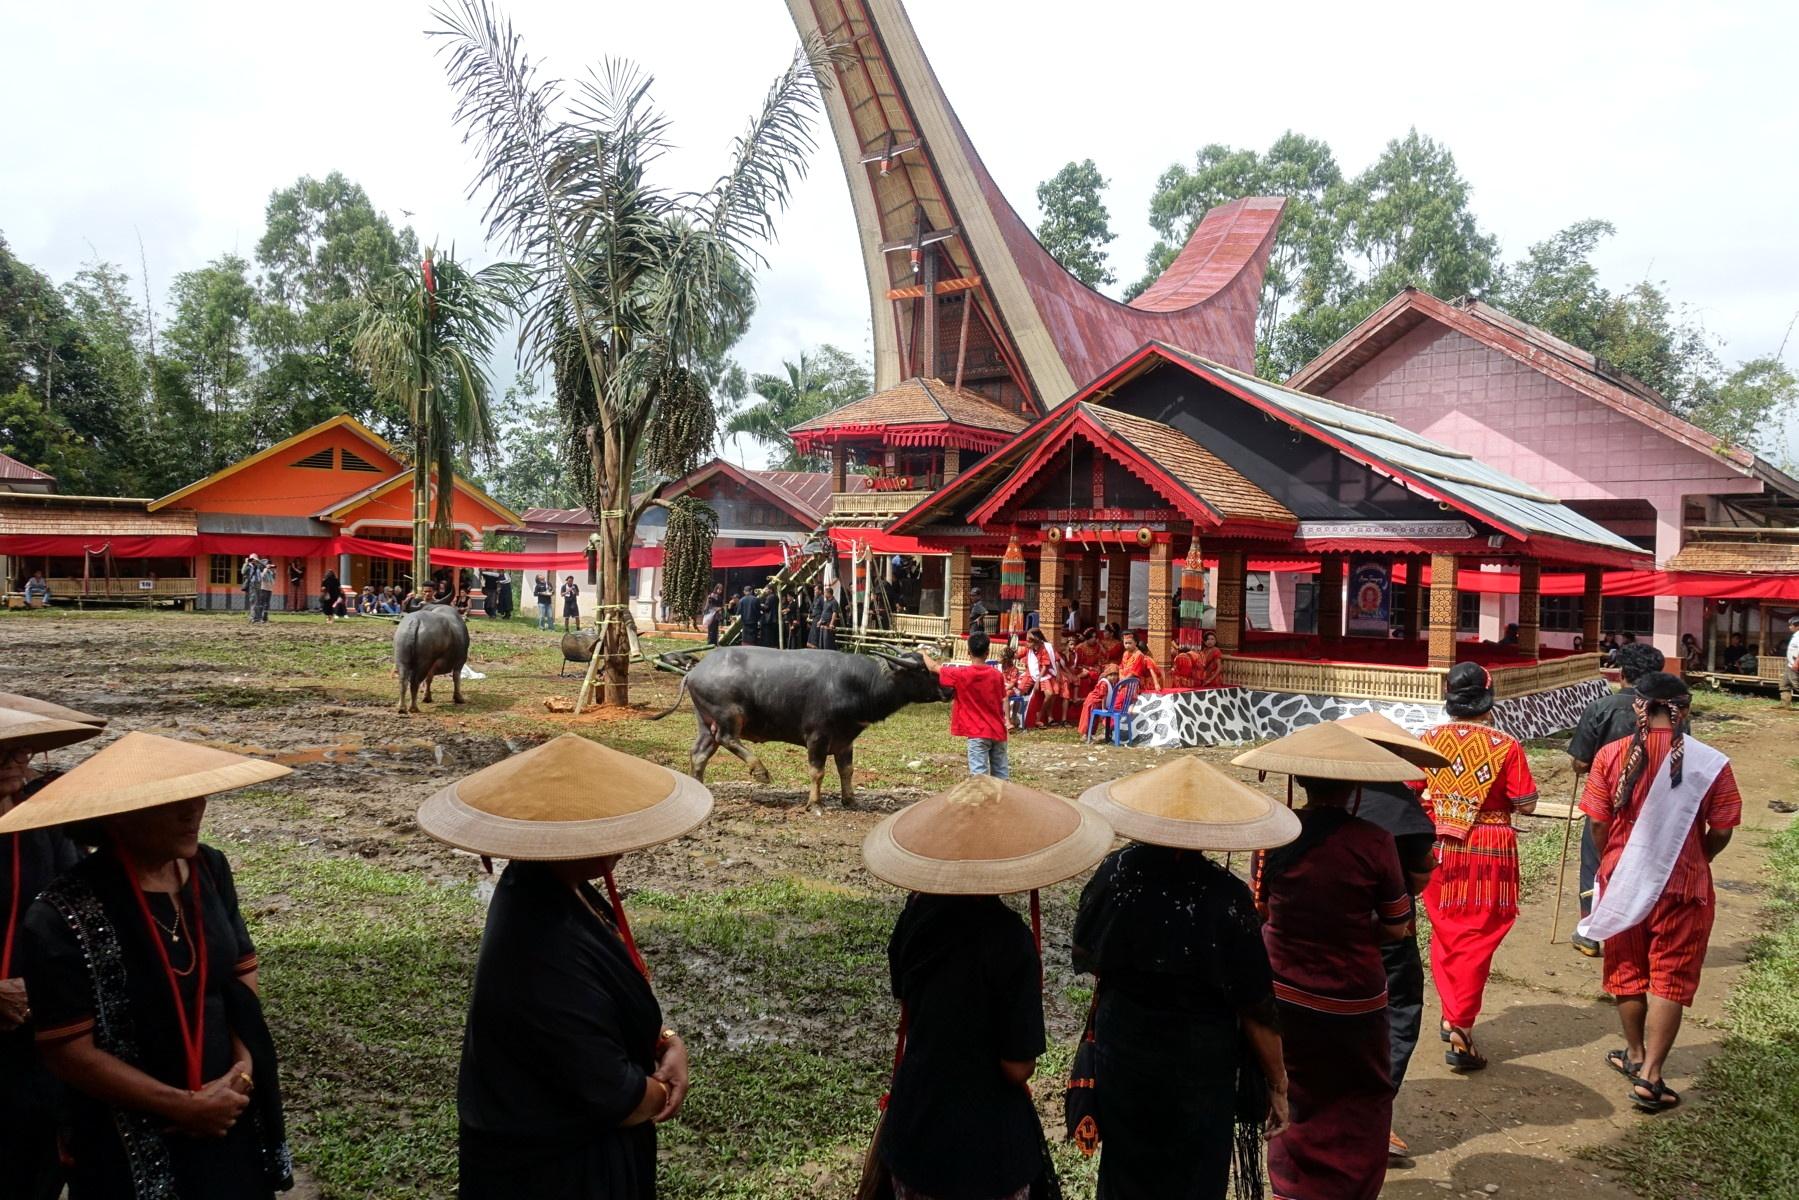 Indonesie_Sulawesi_Toraja_Rantepao DSC04646